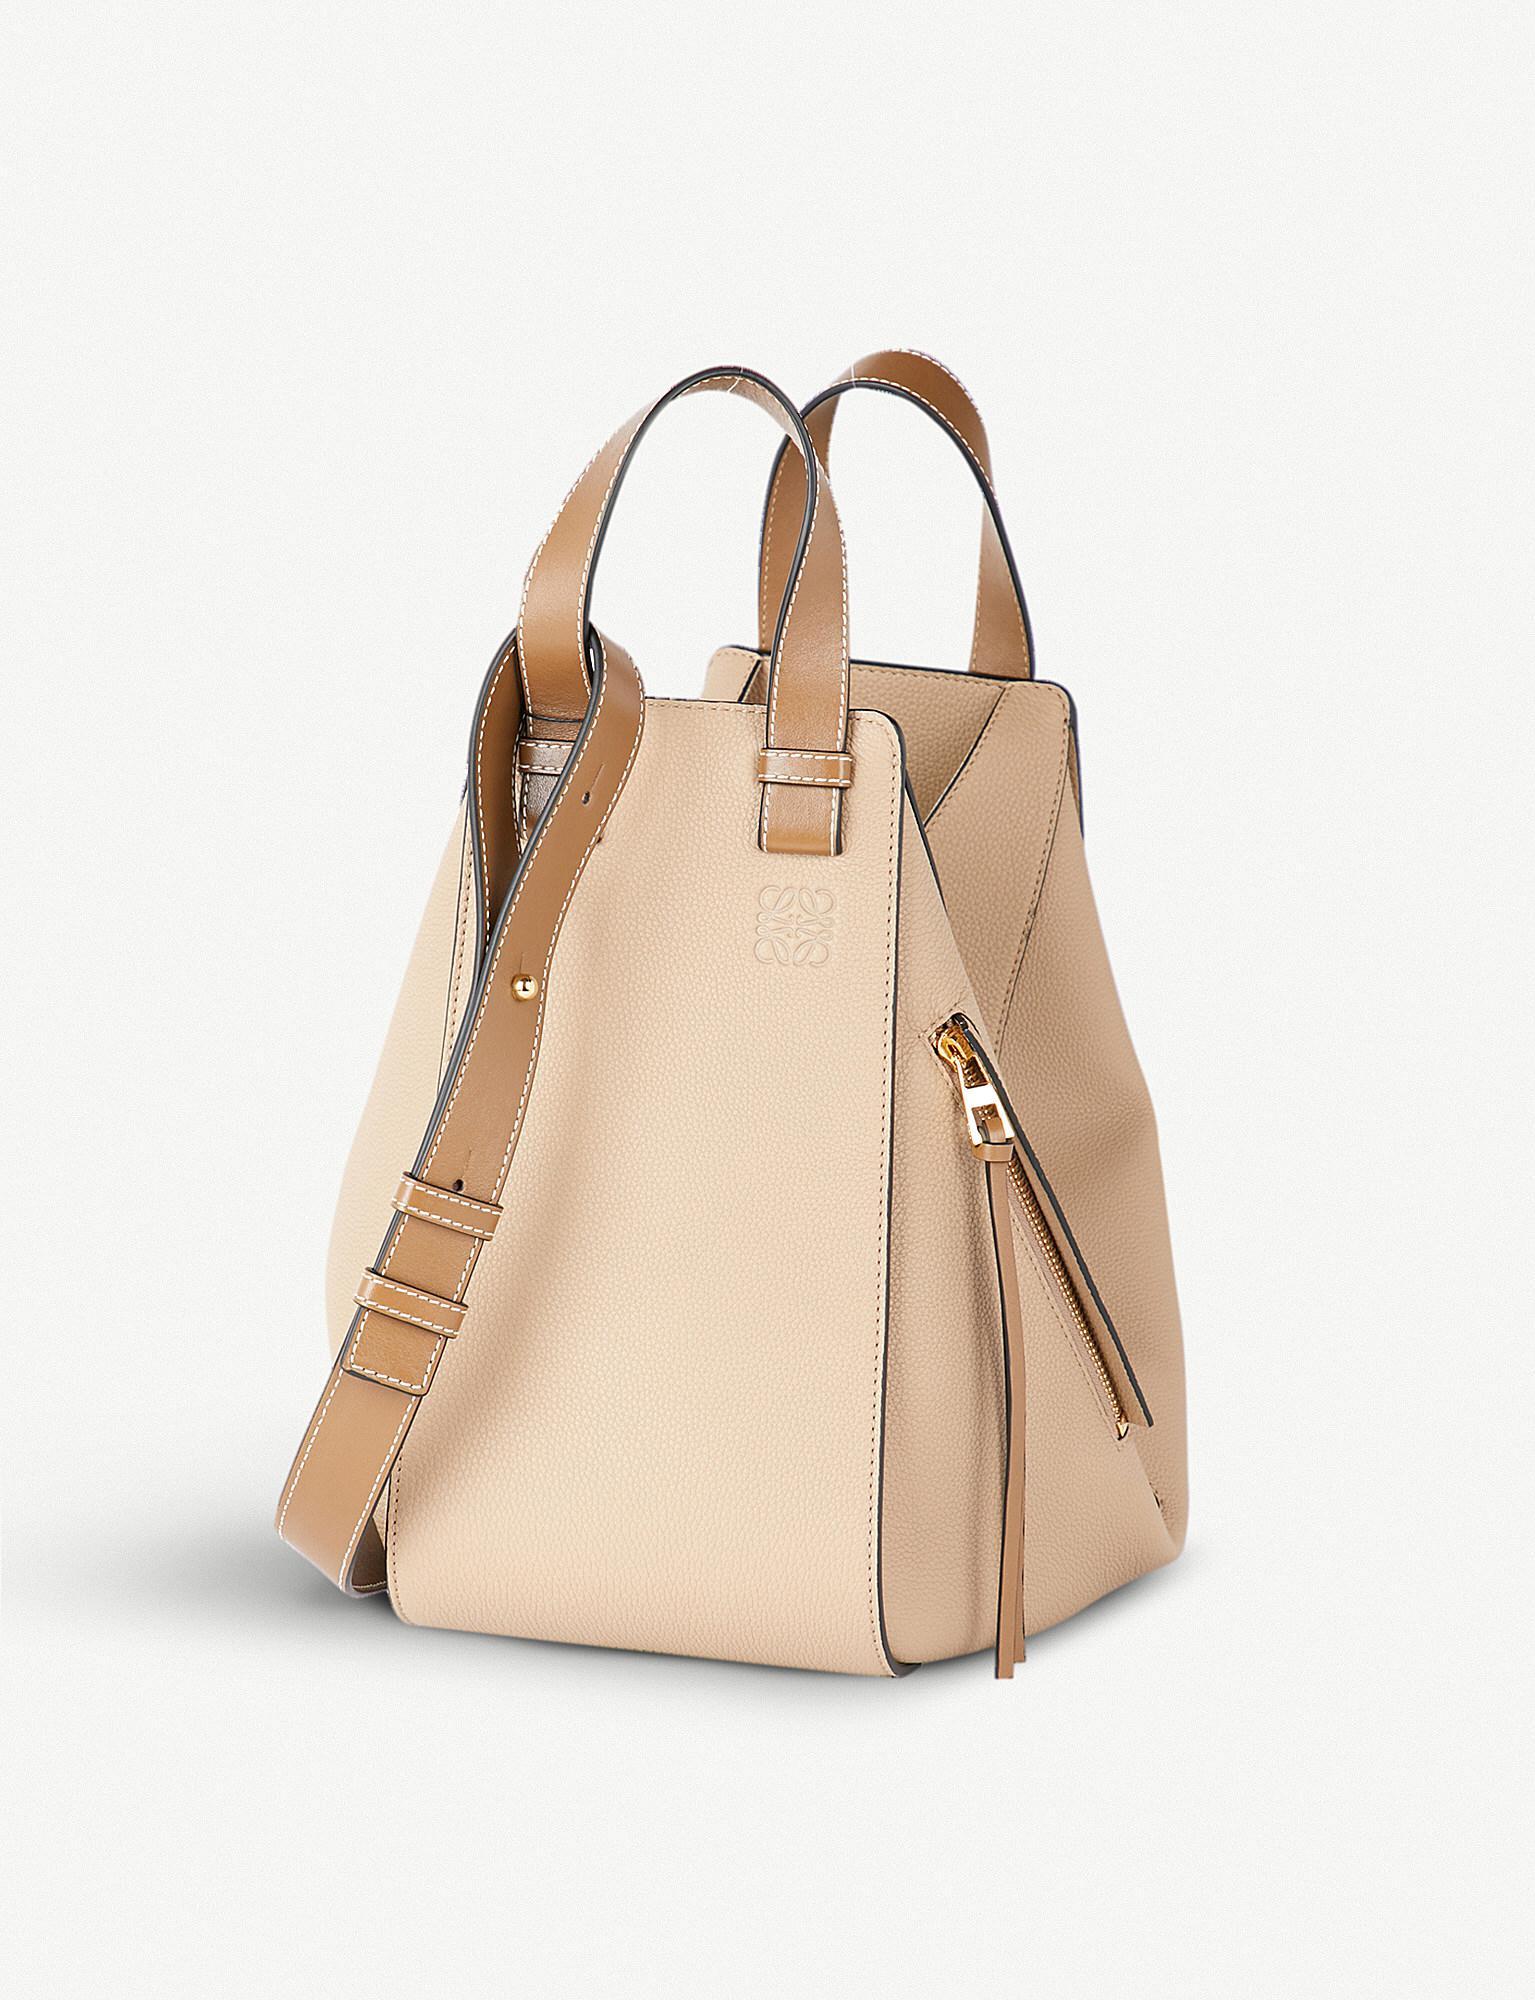 Hammock Medium Leather Shoulder Bag Loewe 9rqn1yUv